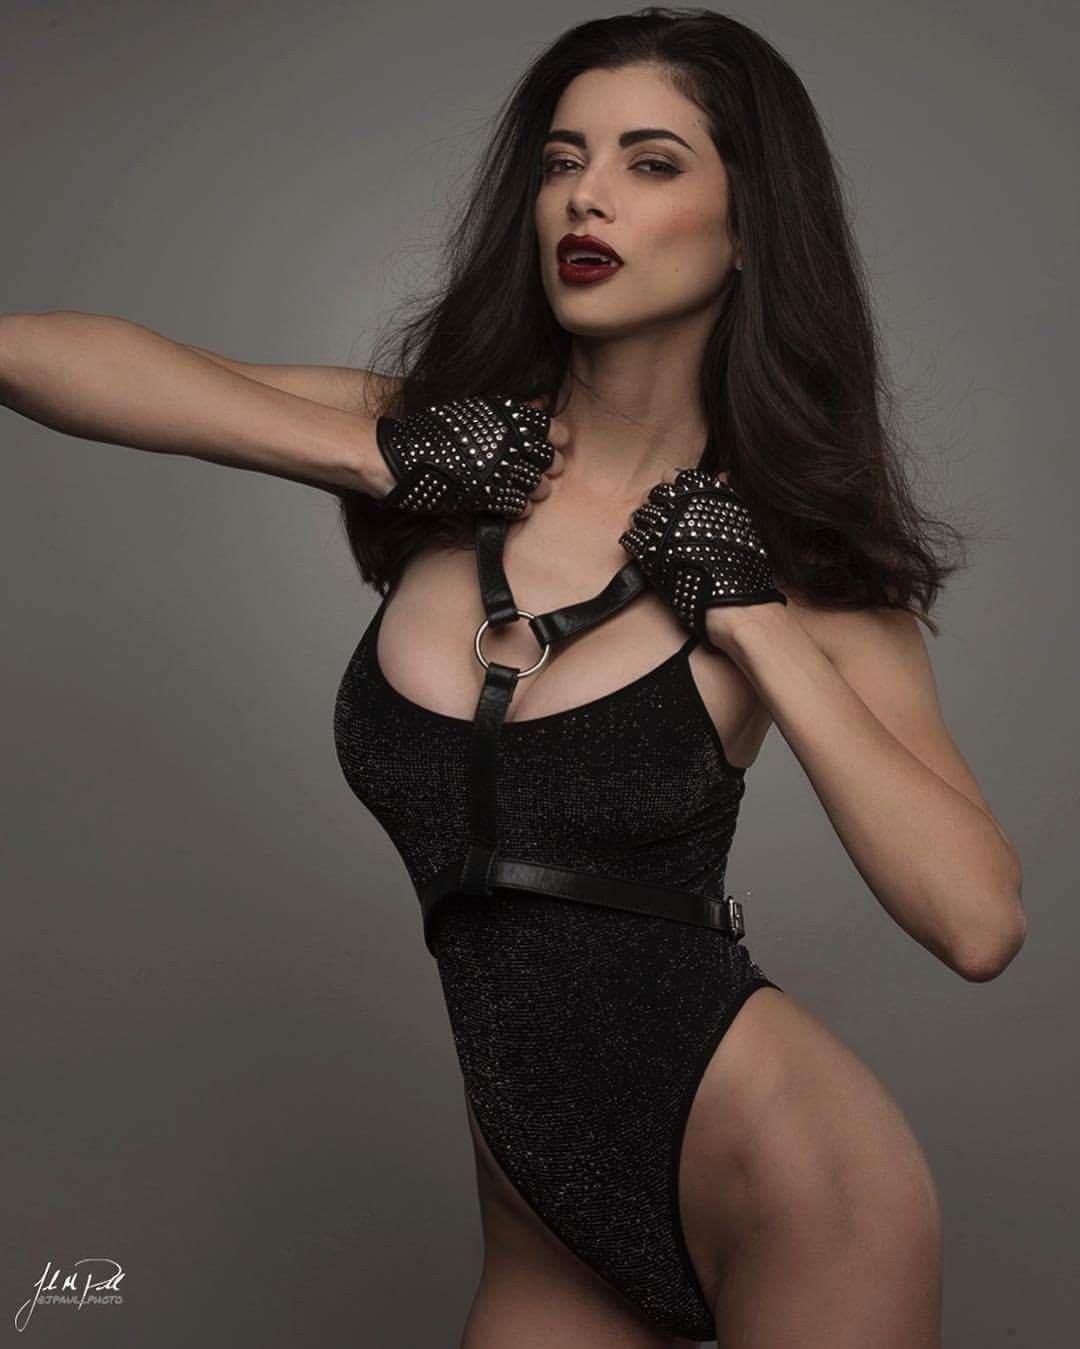 Sharon stone sex video clip in basic instinct